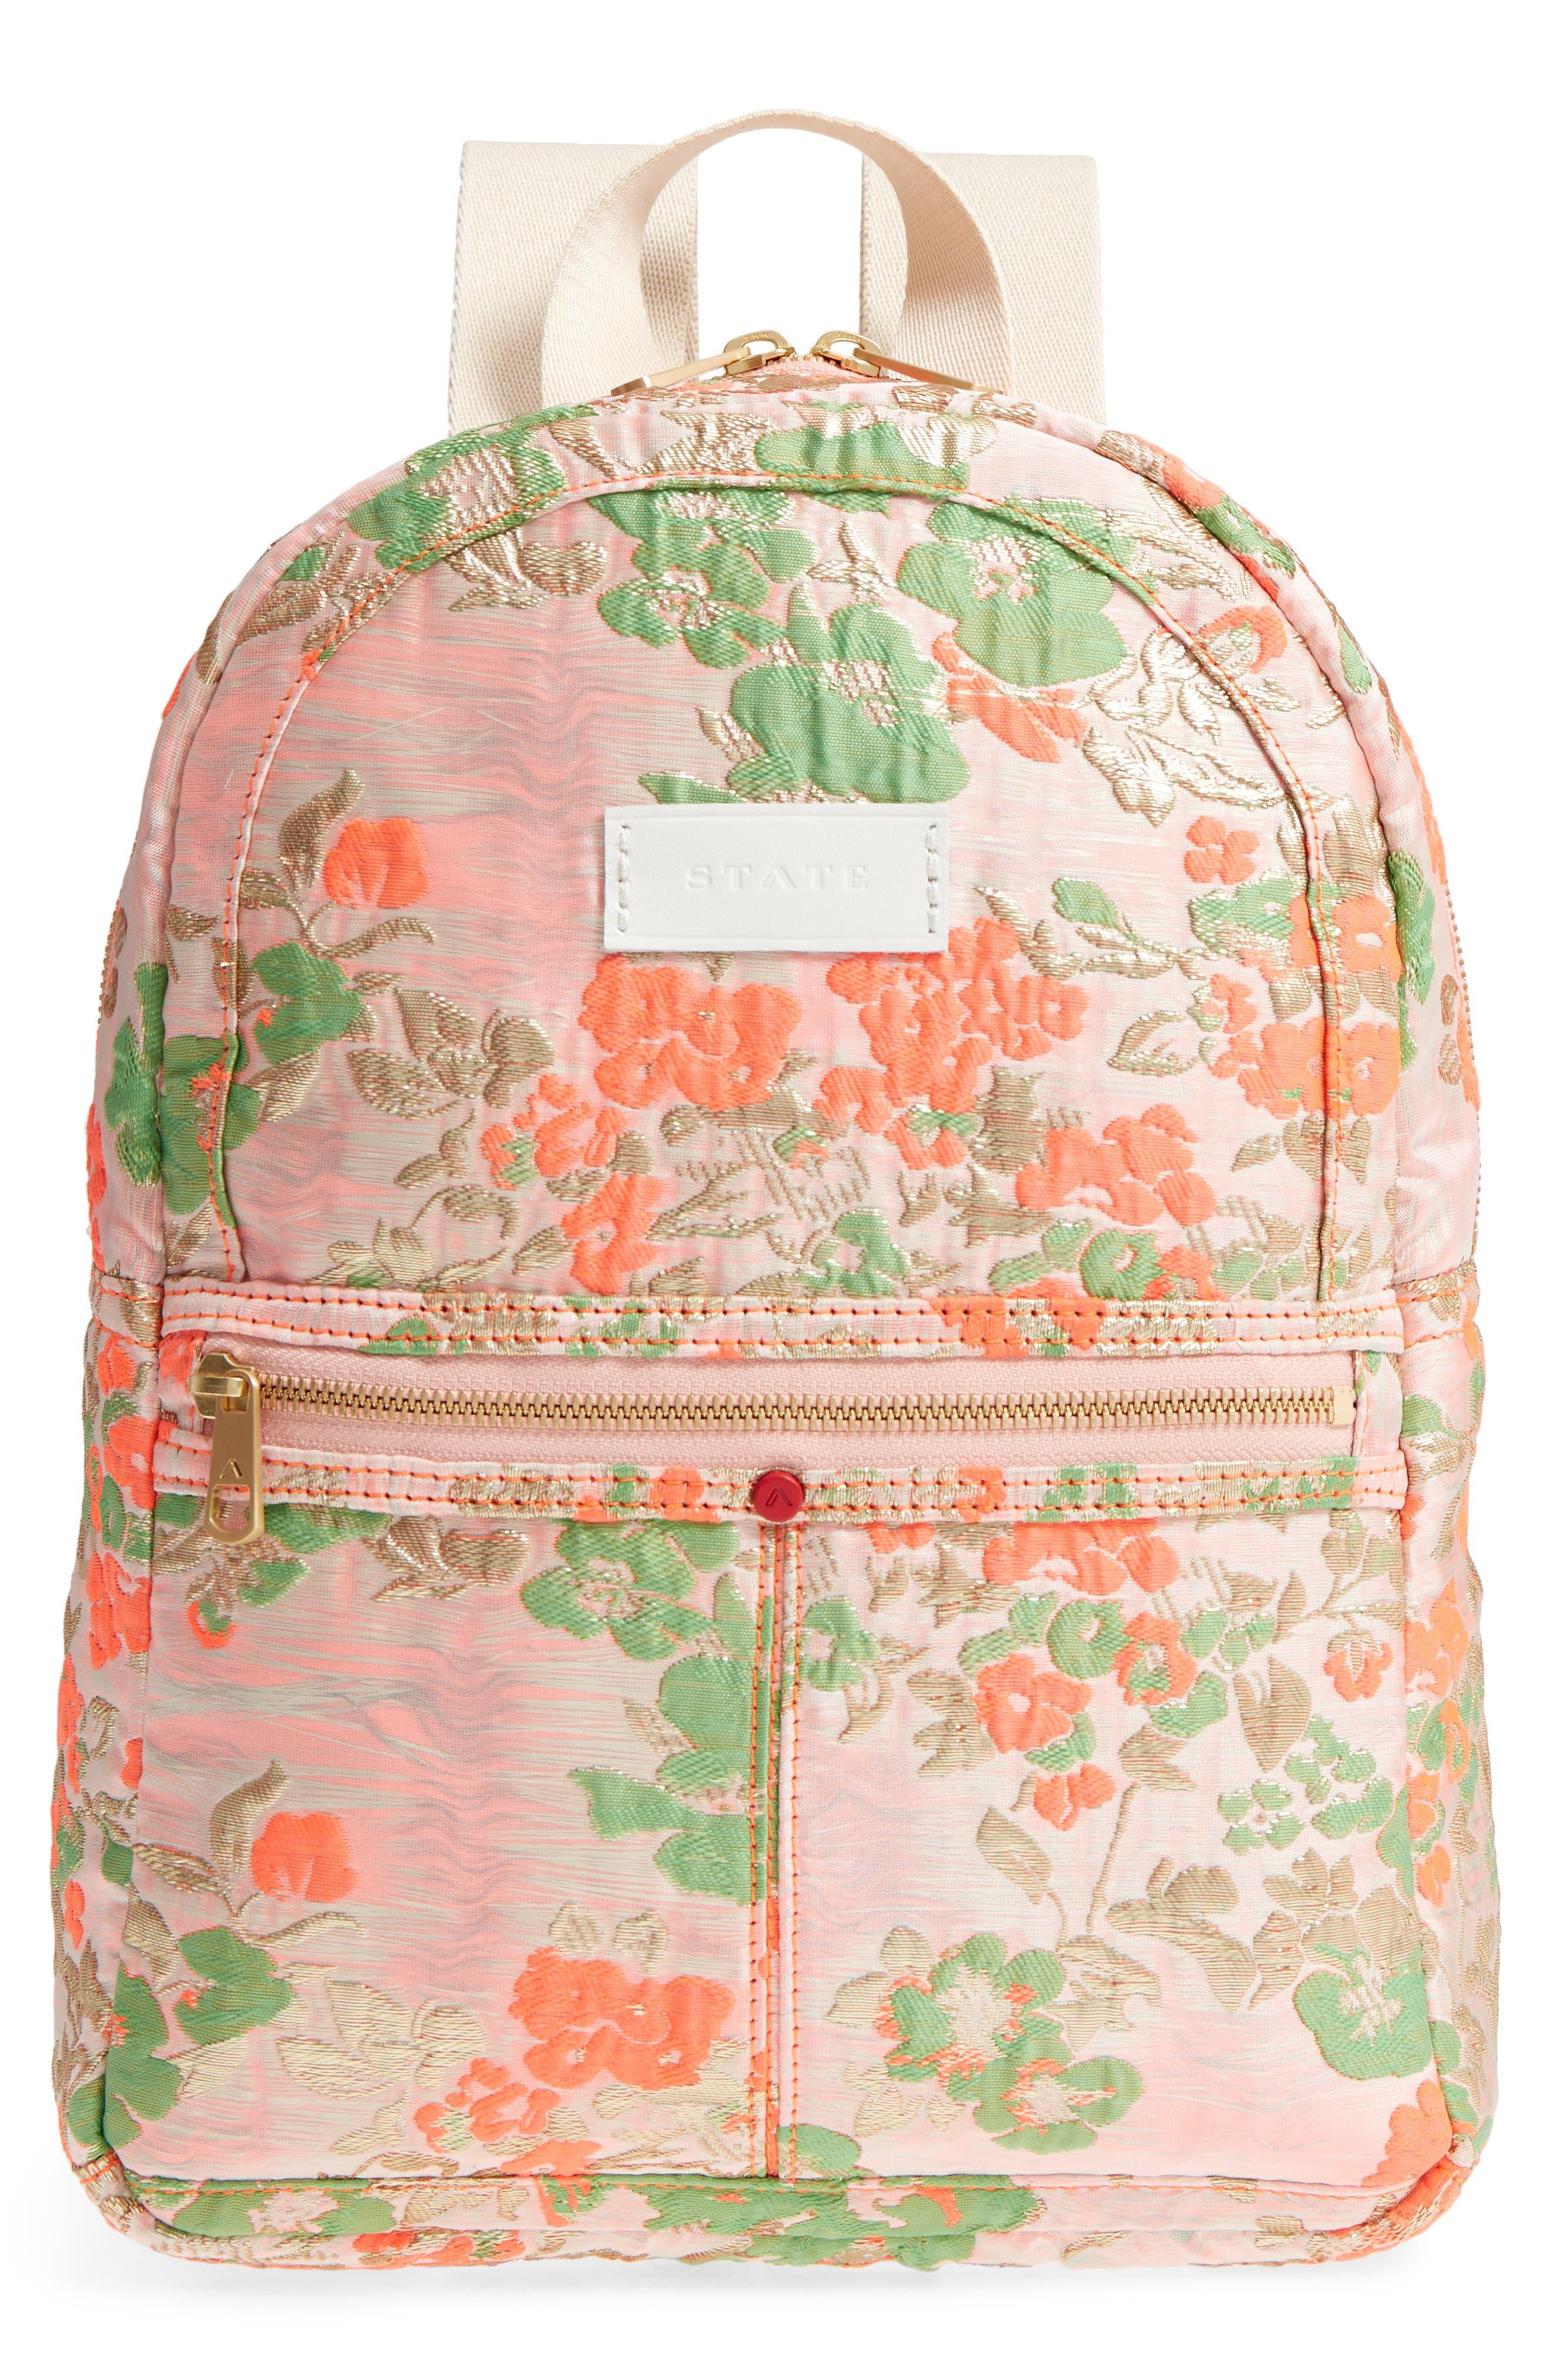 Alternate Image 1 Selected - STATE Bags Mini Kane Brocade Backpack